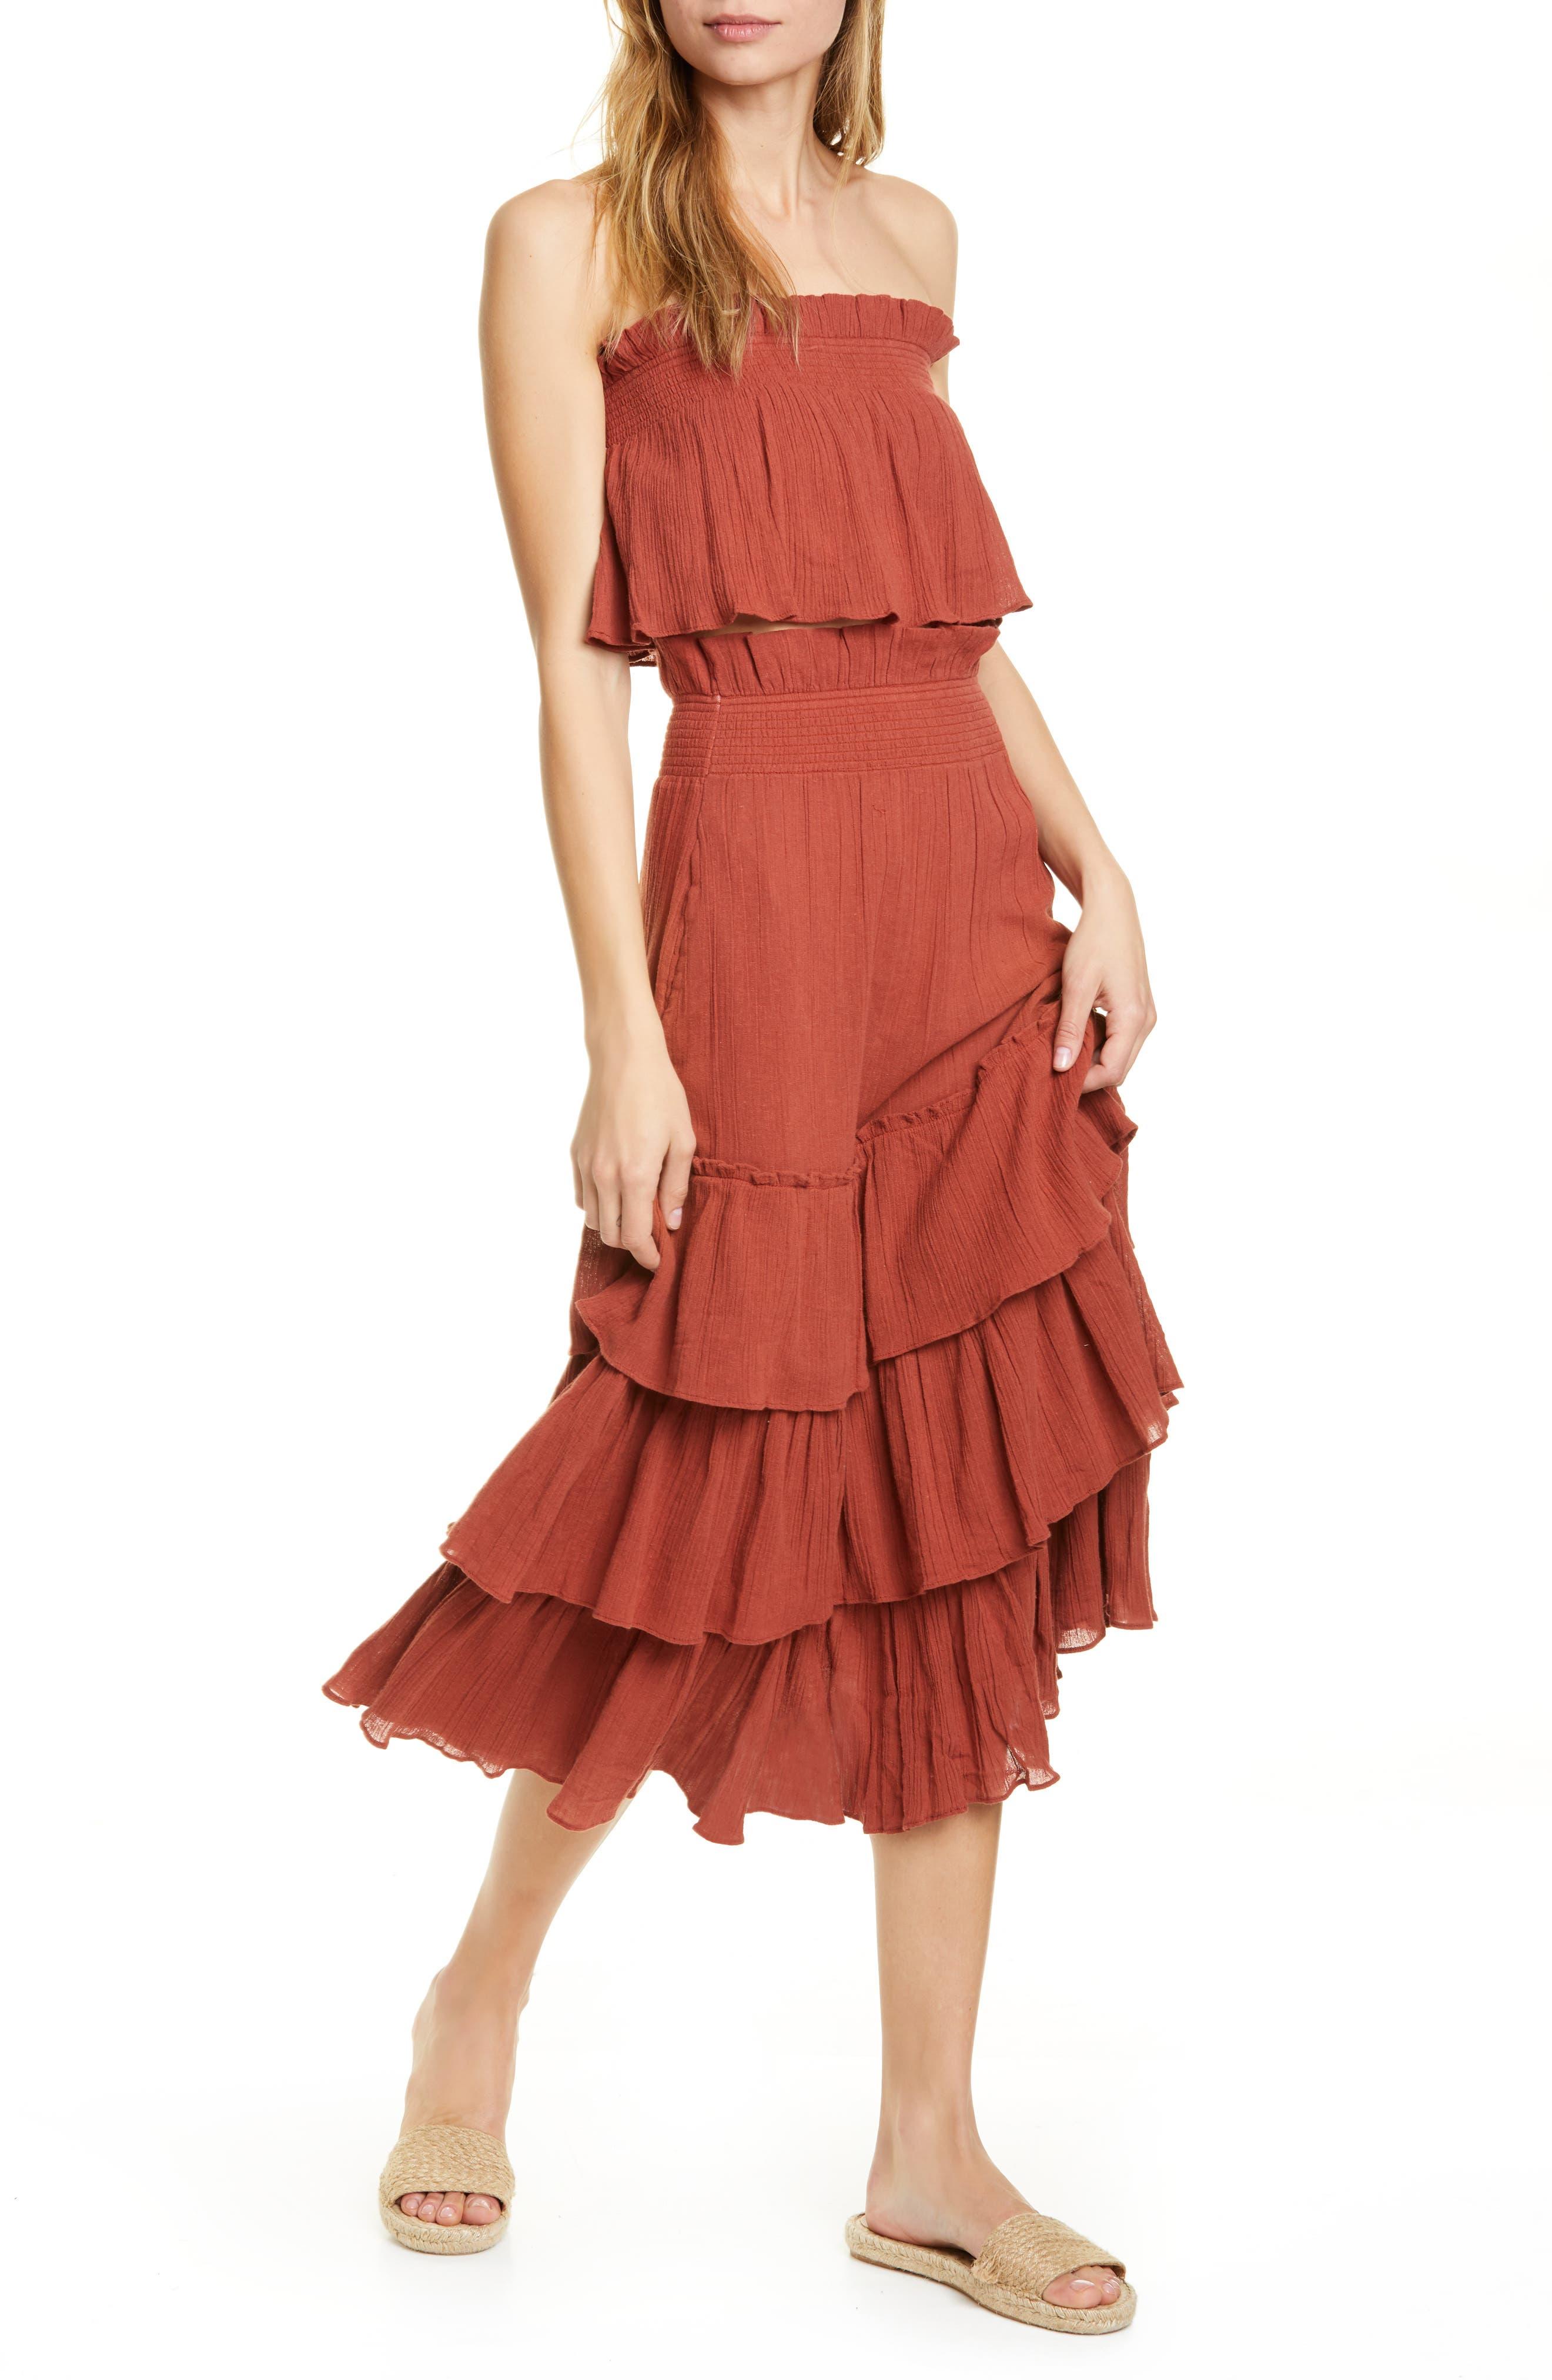 Endless Summer By Free People Sea Breeze Strapless Crop Top & Midi Skirt, Orange